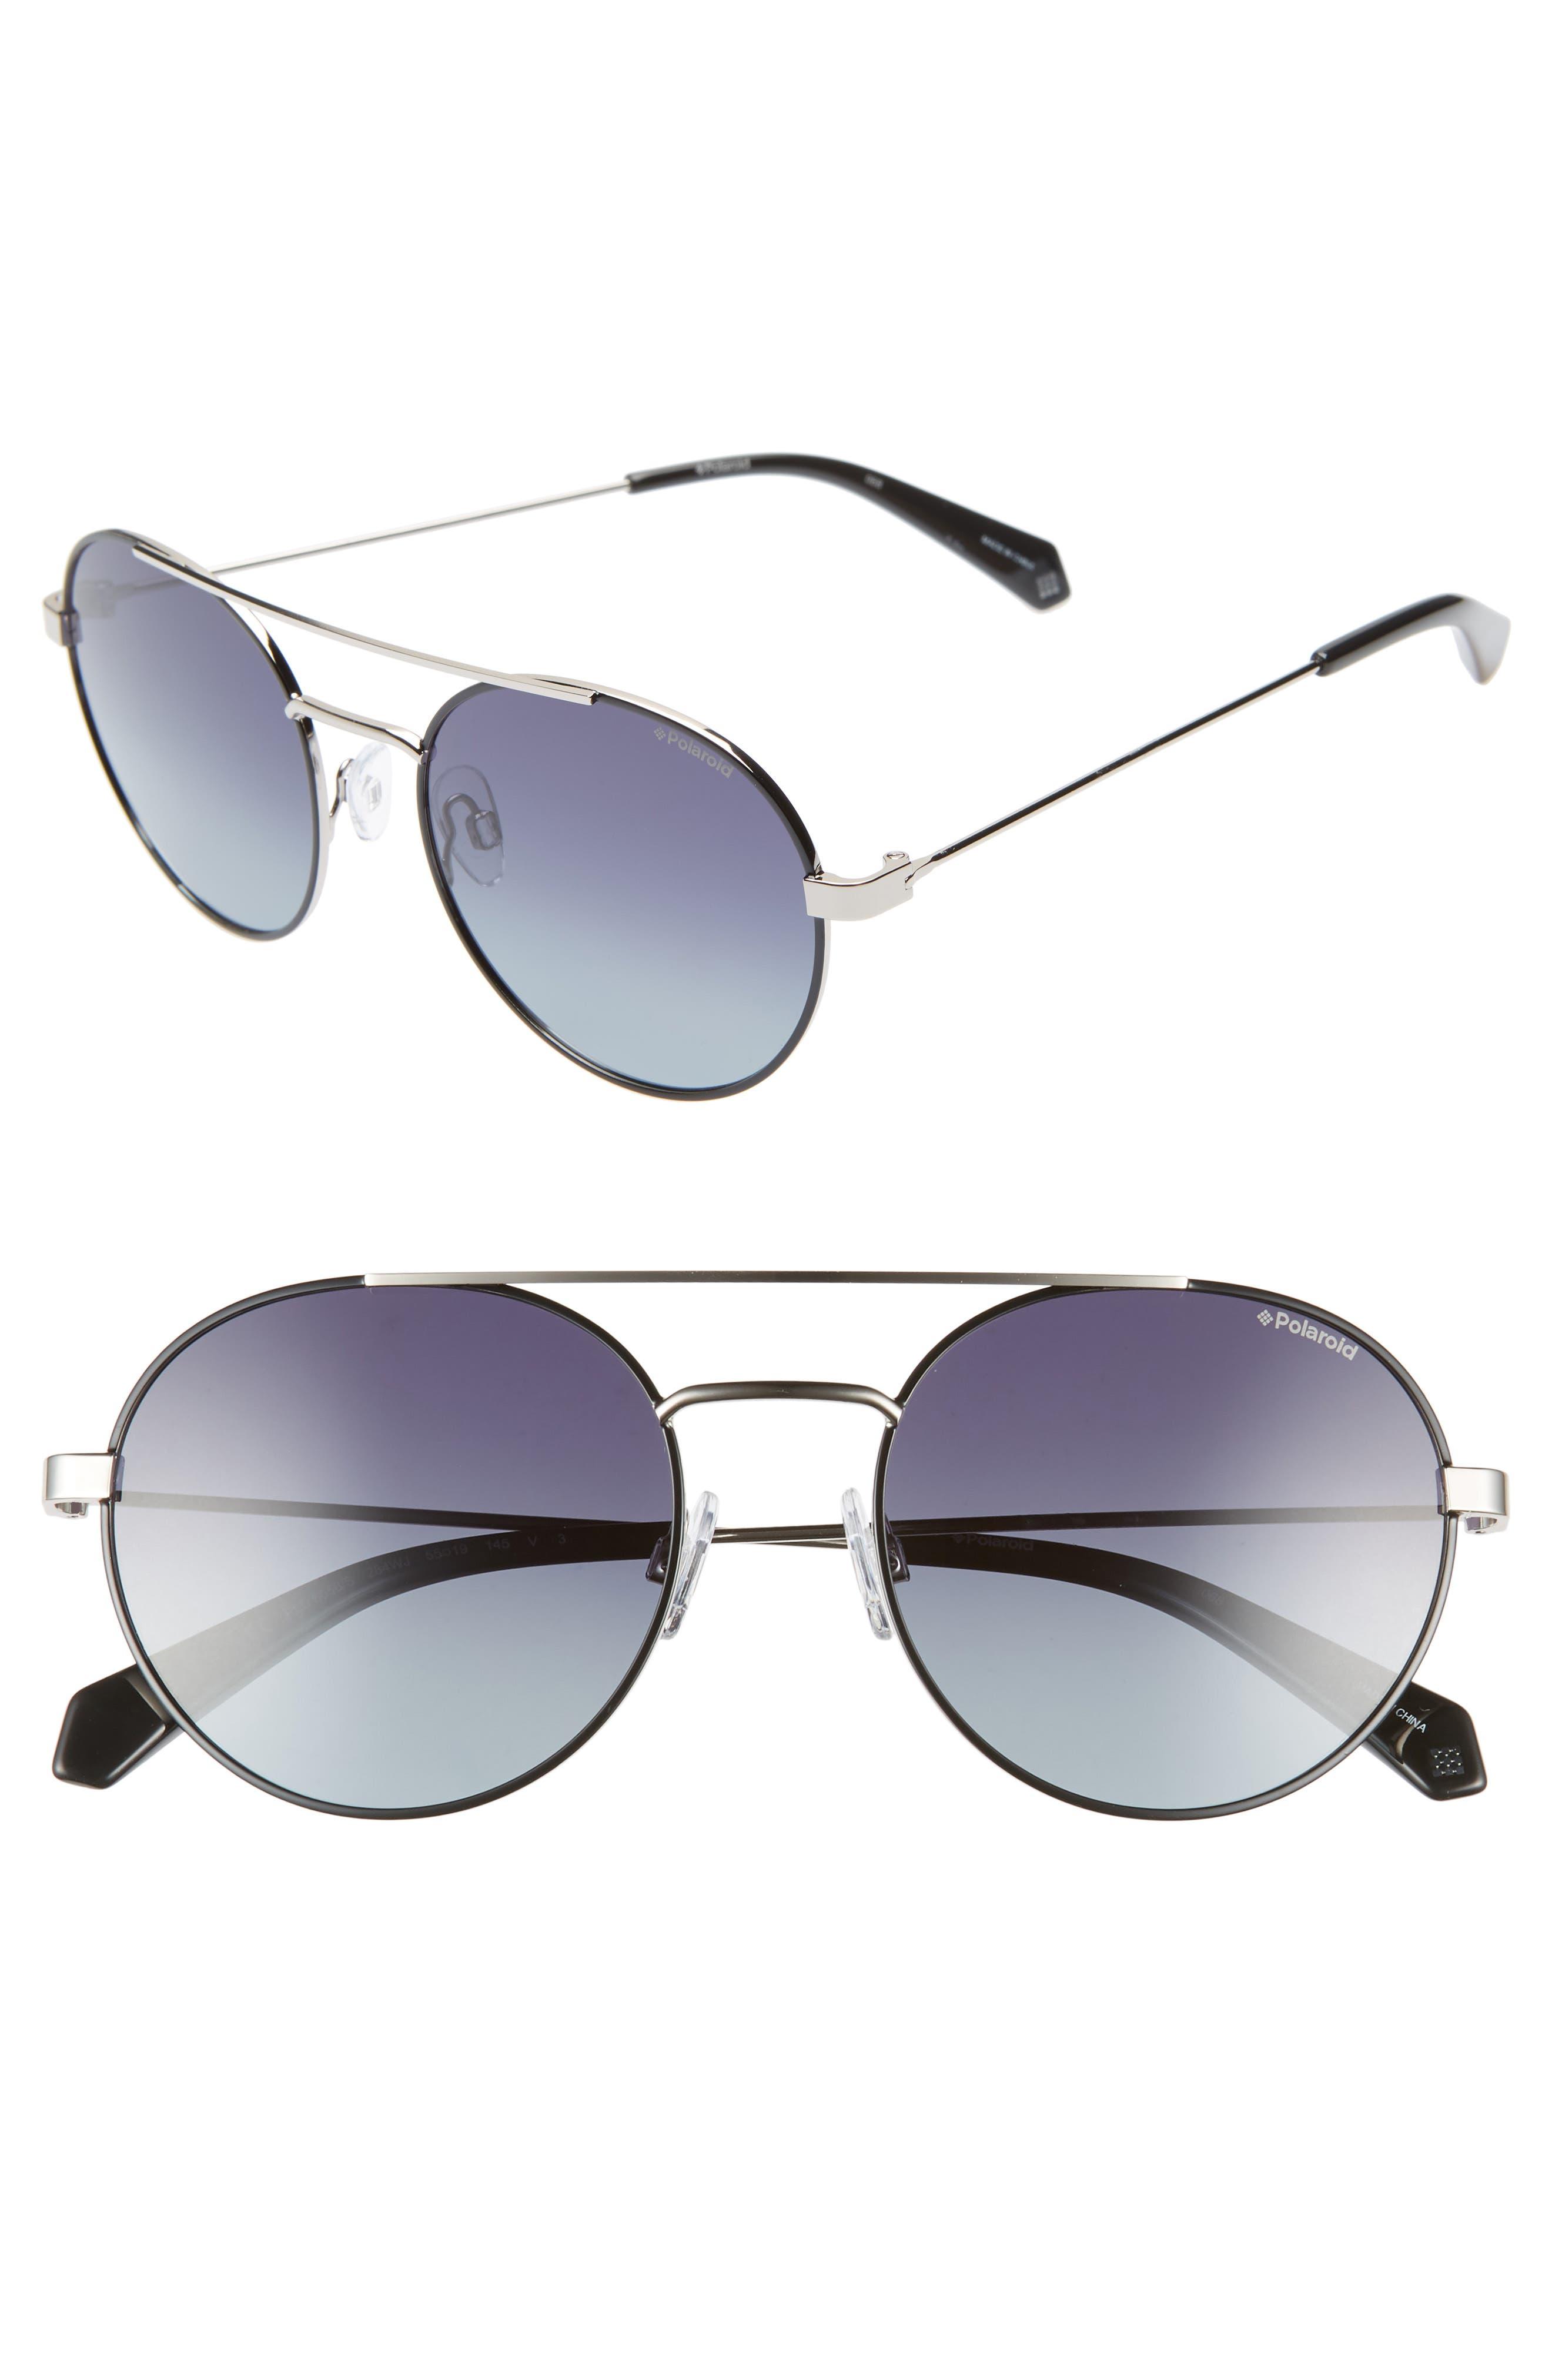 POLAROID EYEWEAR Polaroid 55mm Polarized Round Aviator Sunglasses, Main, color, BLACK RUTHENIUM